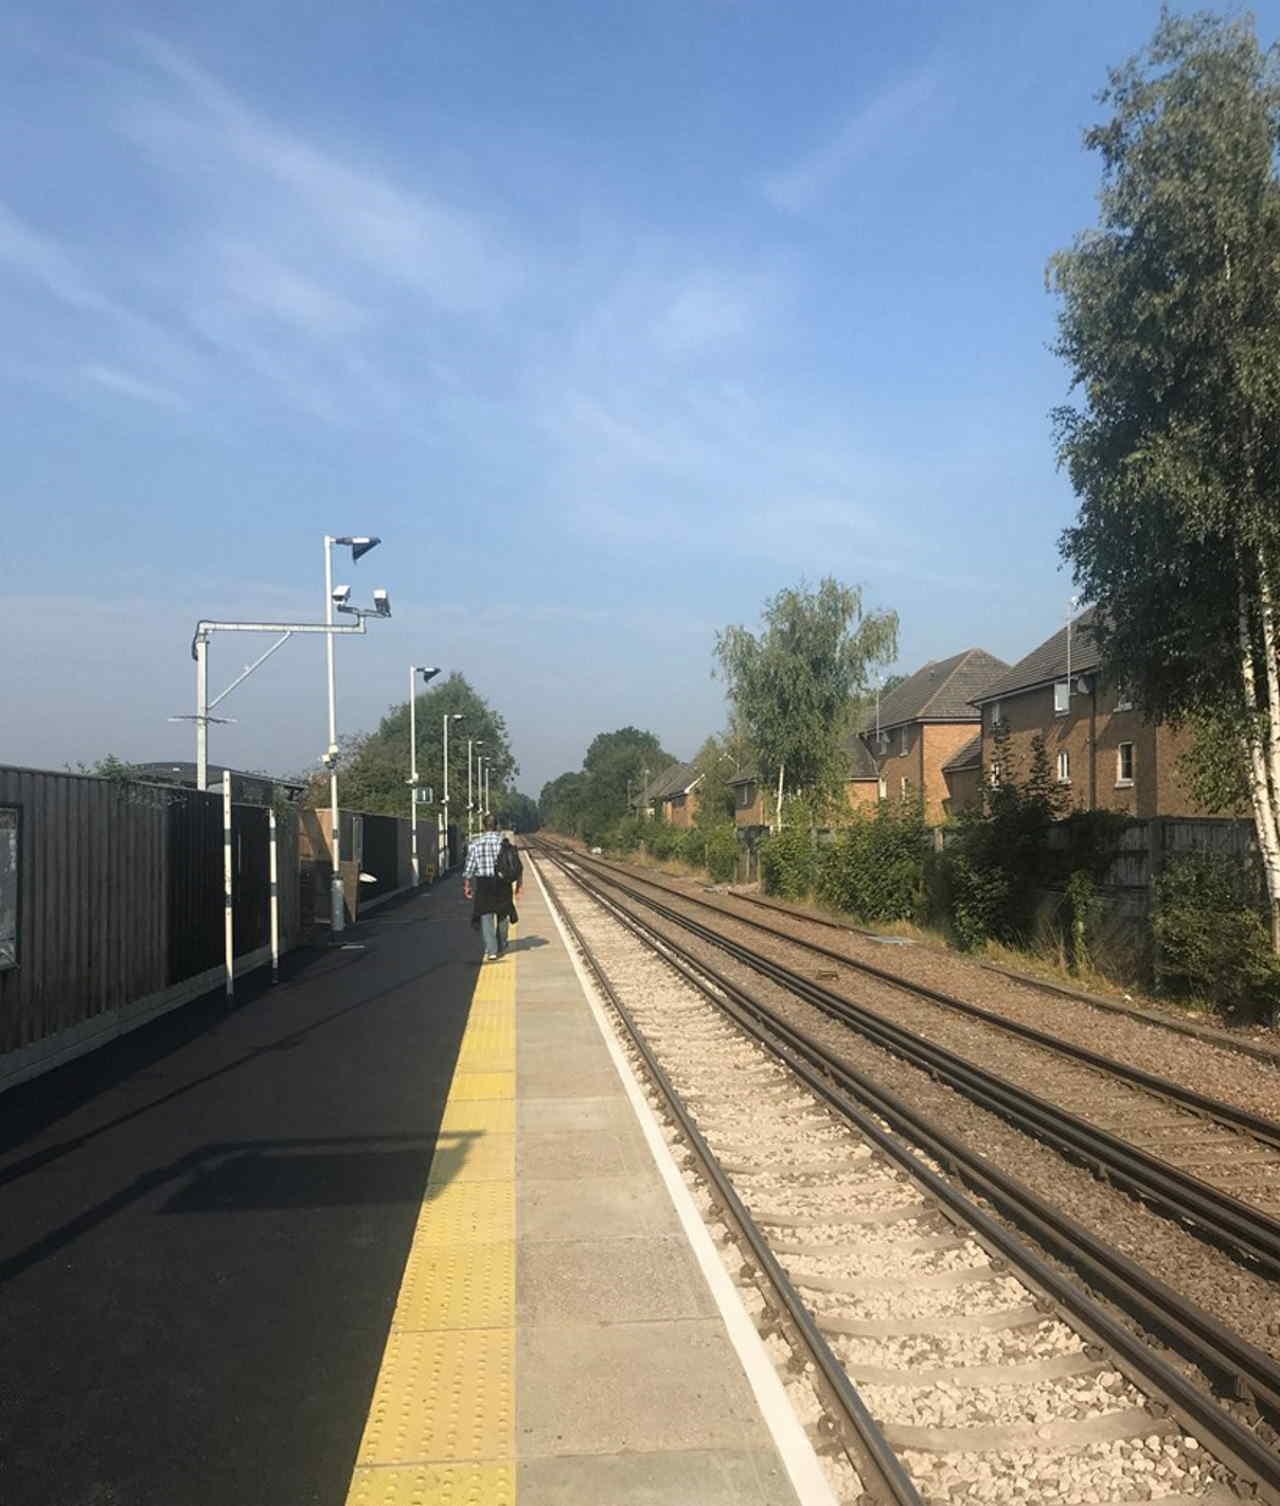 [NWR] Edenbrige station